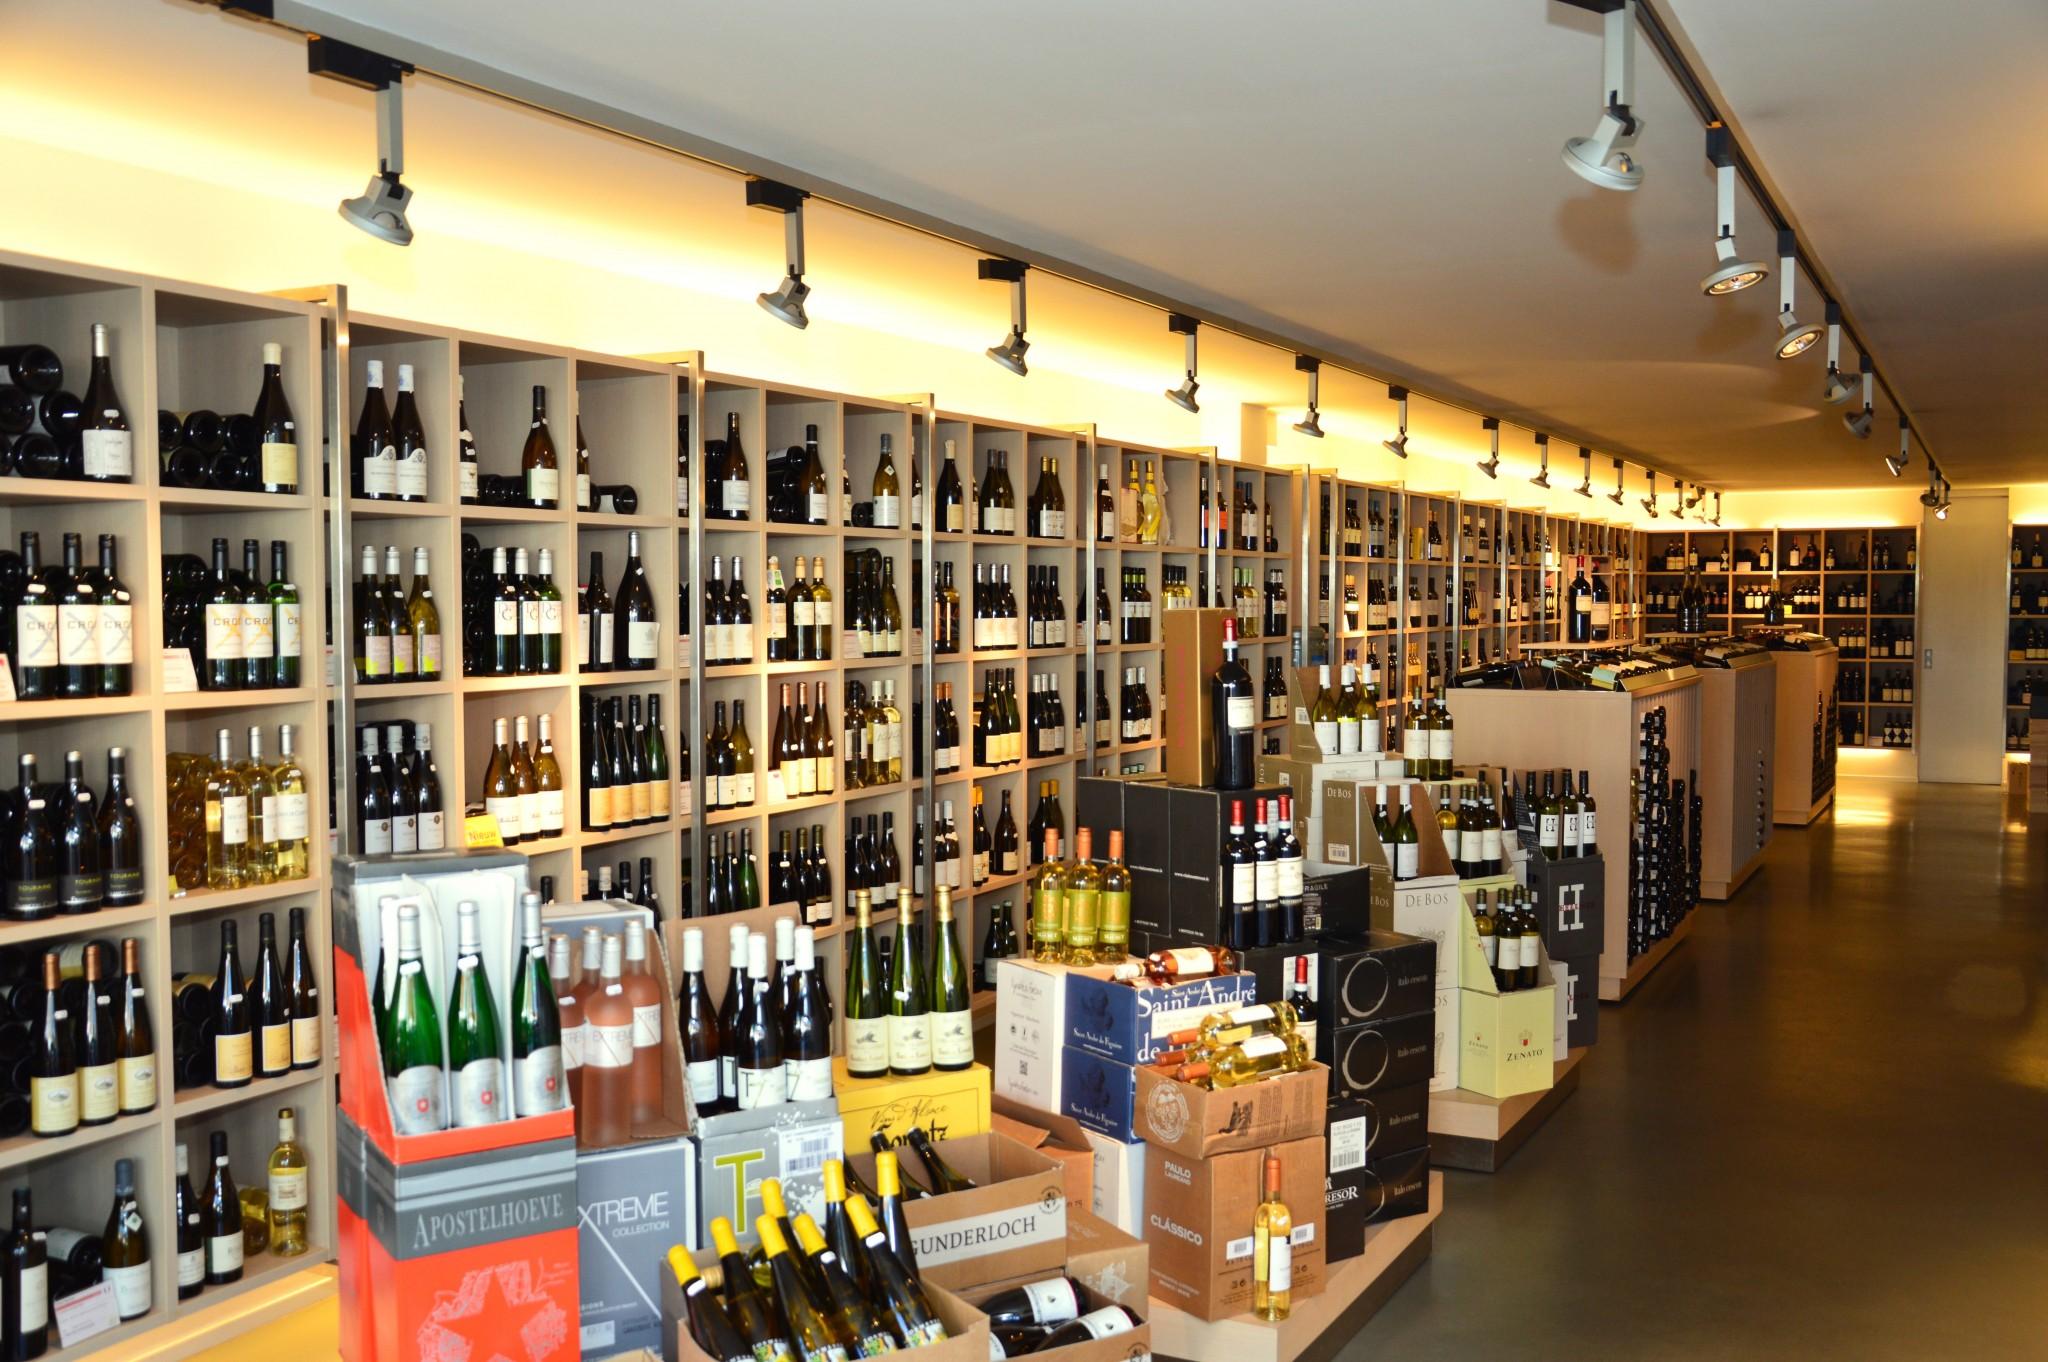 Wijnspeciaalzaak Le Grand Cru